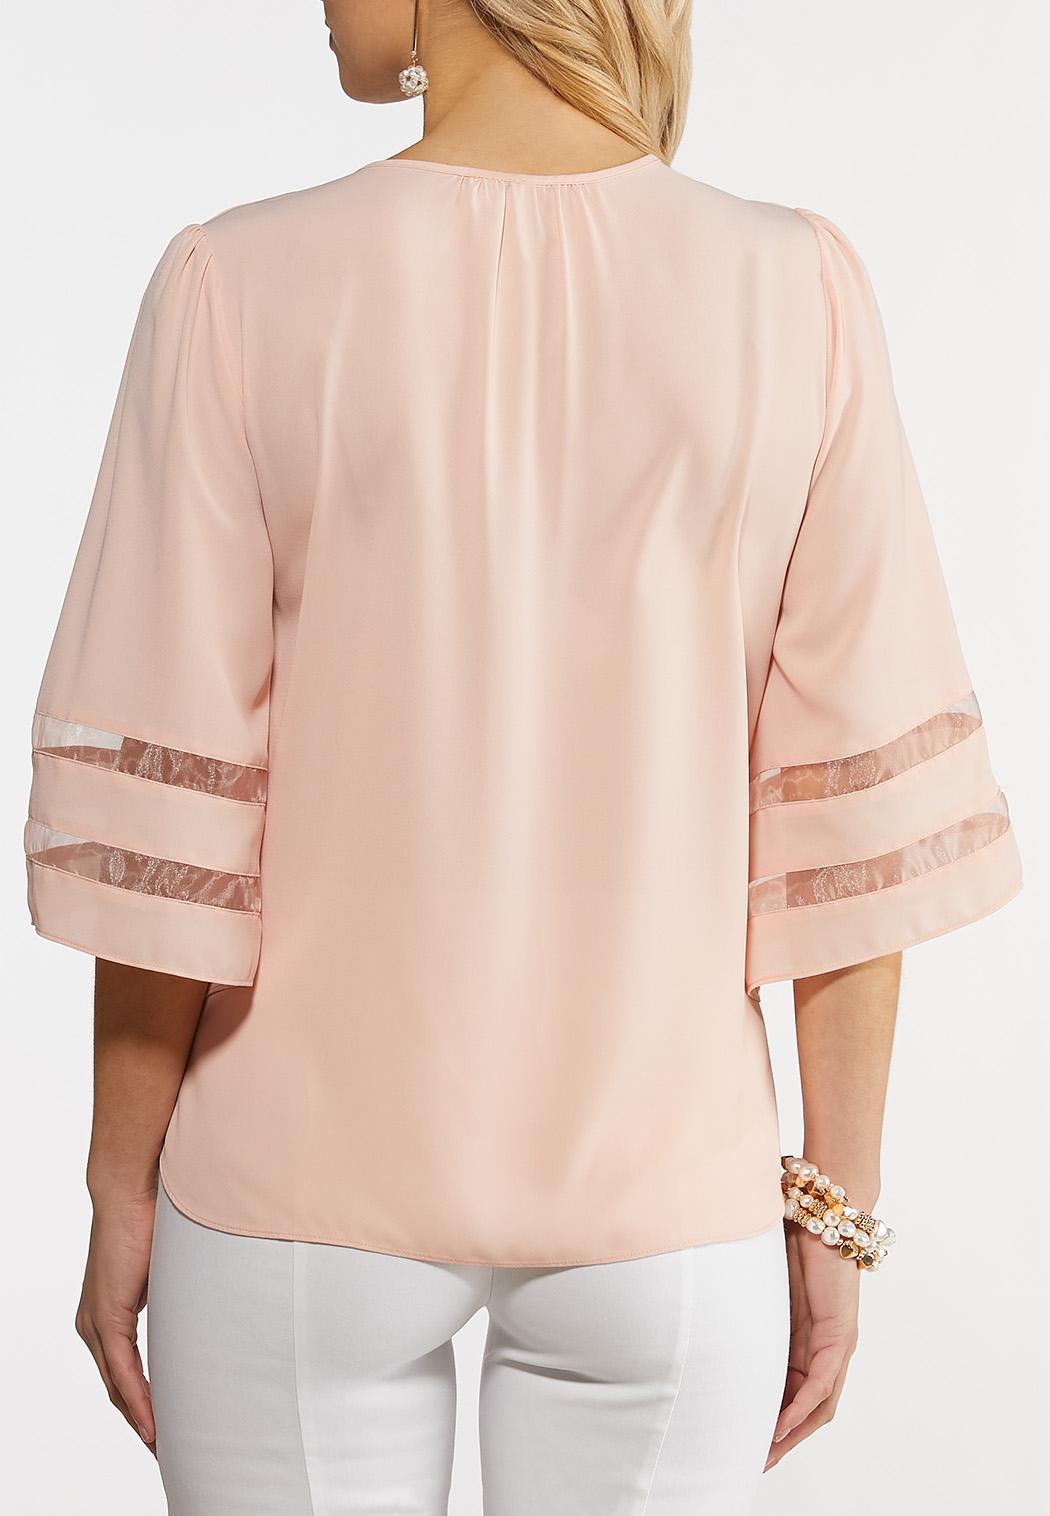 Blush Illusion Sleeve Top (Item #44208085)